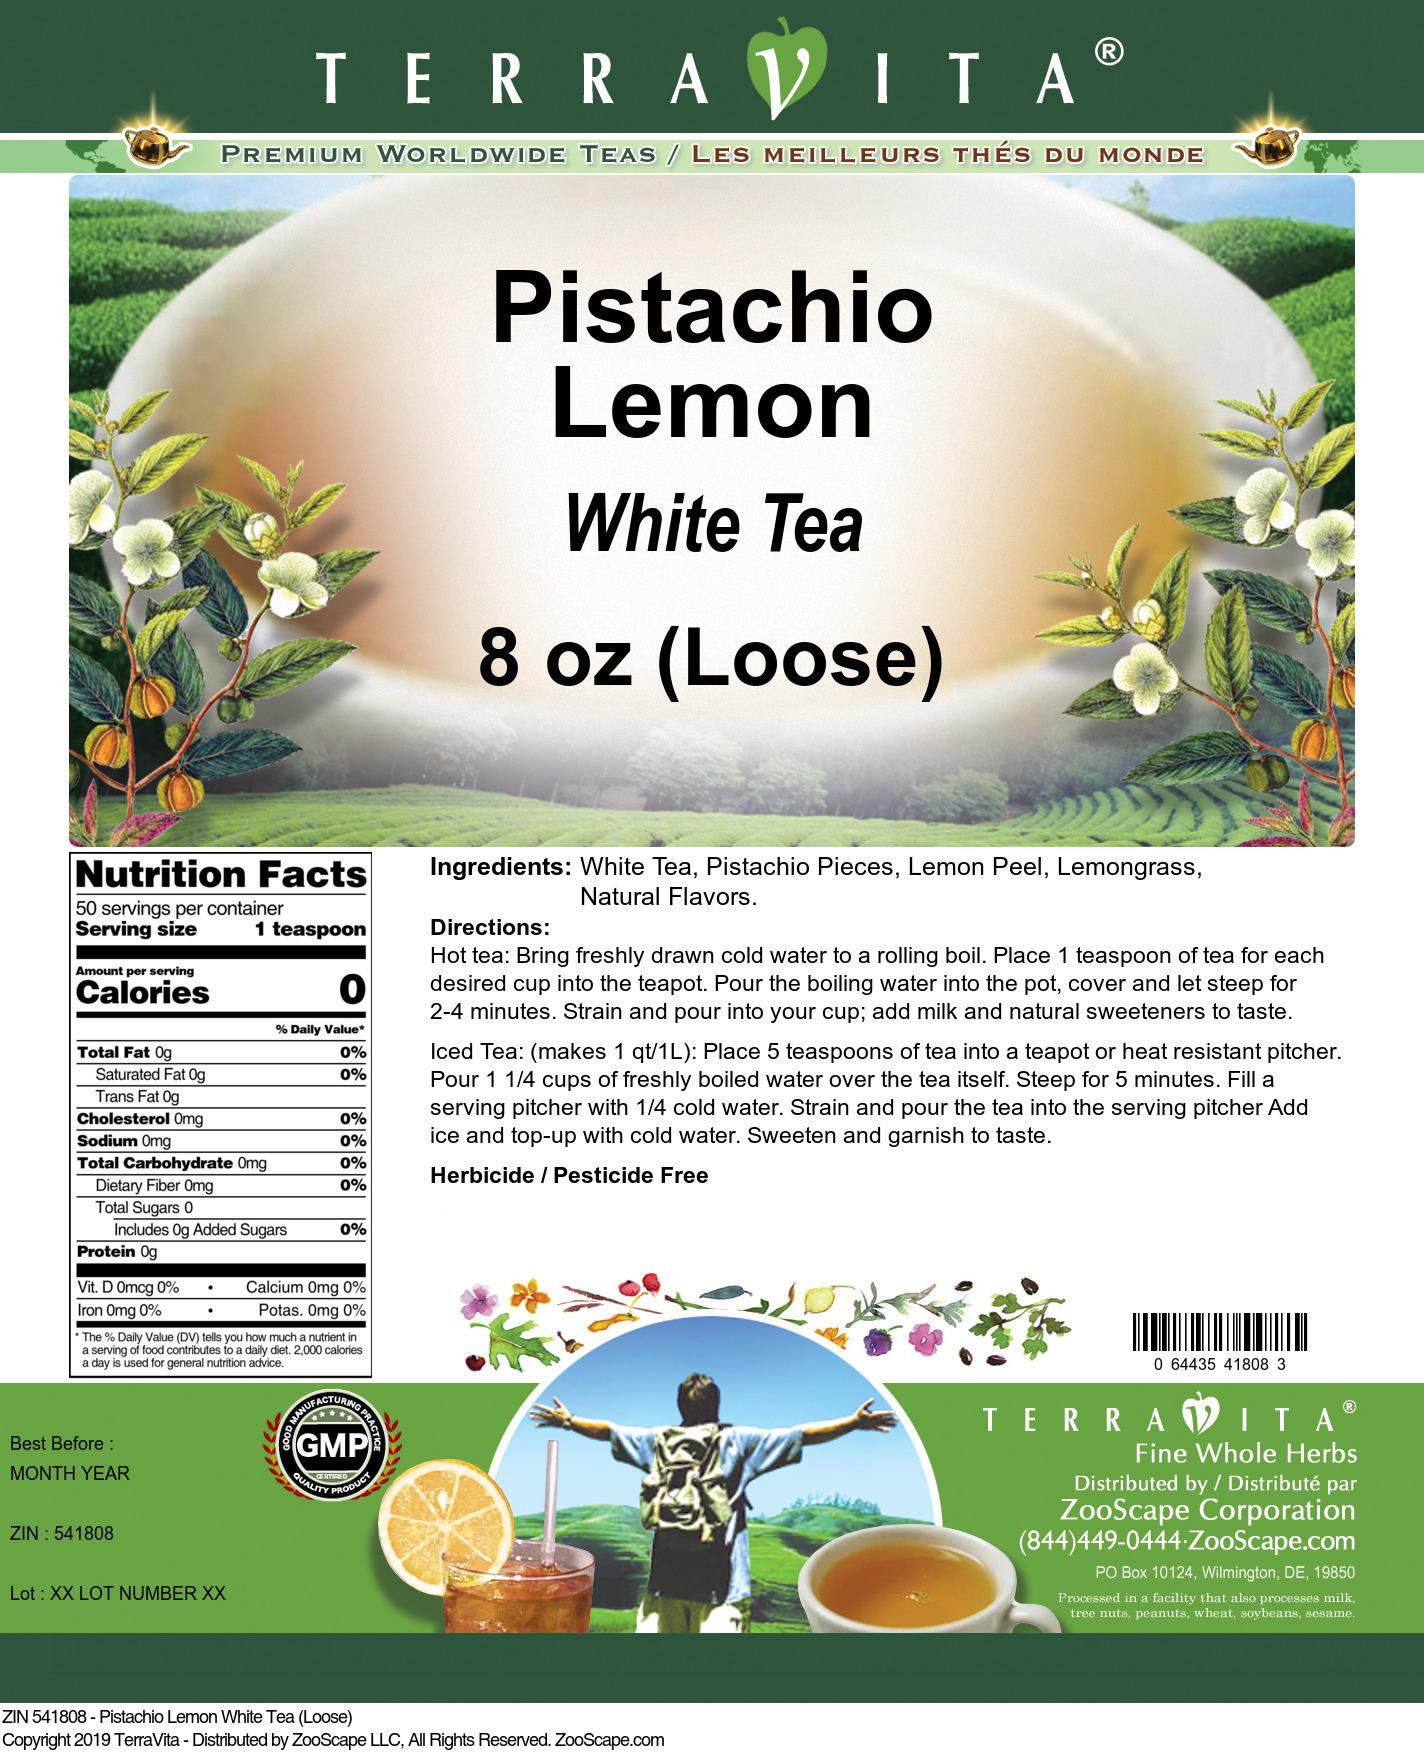 Pistachio Lemon White Tea (Loose)